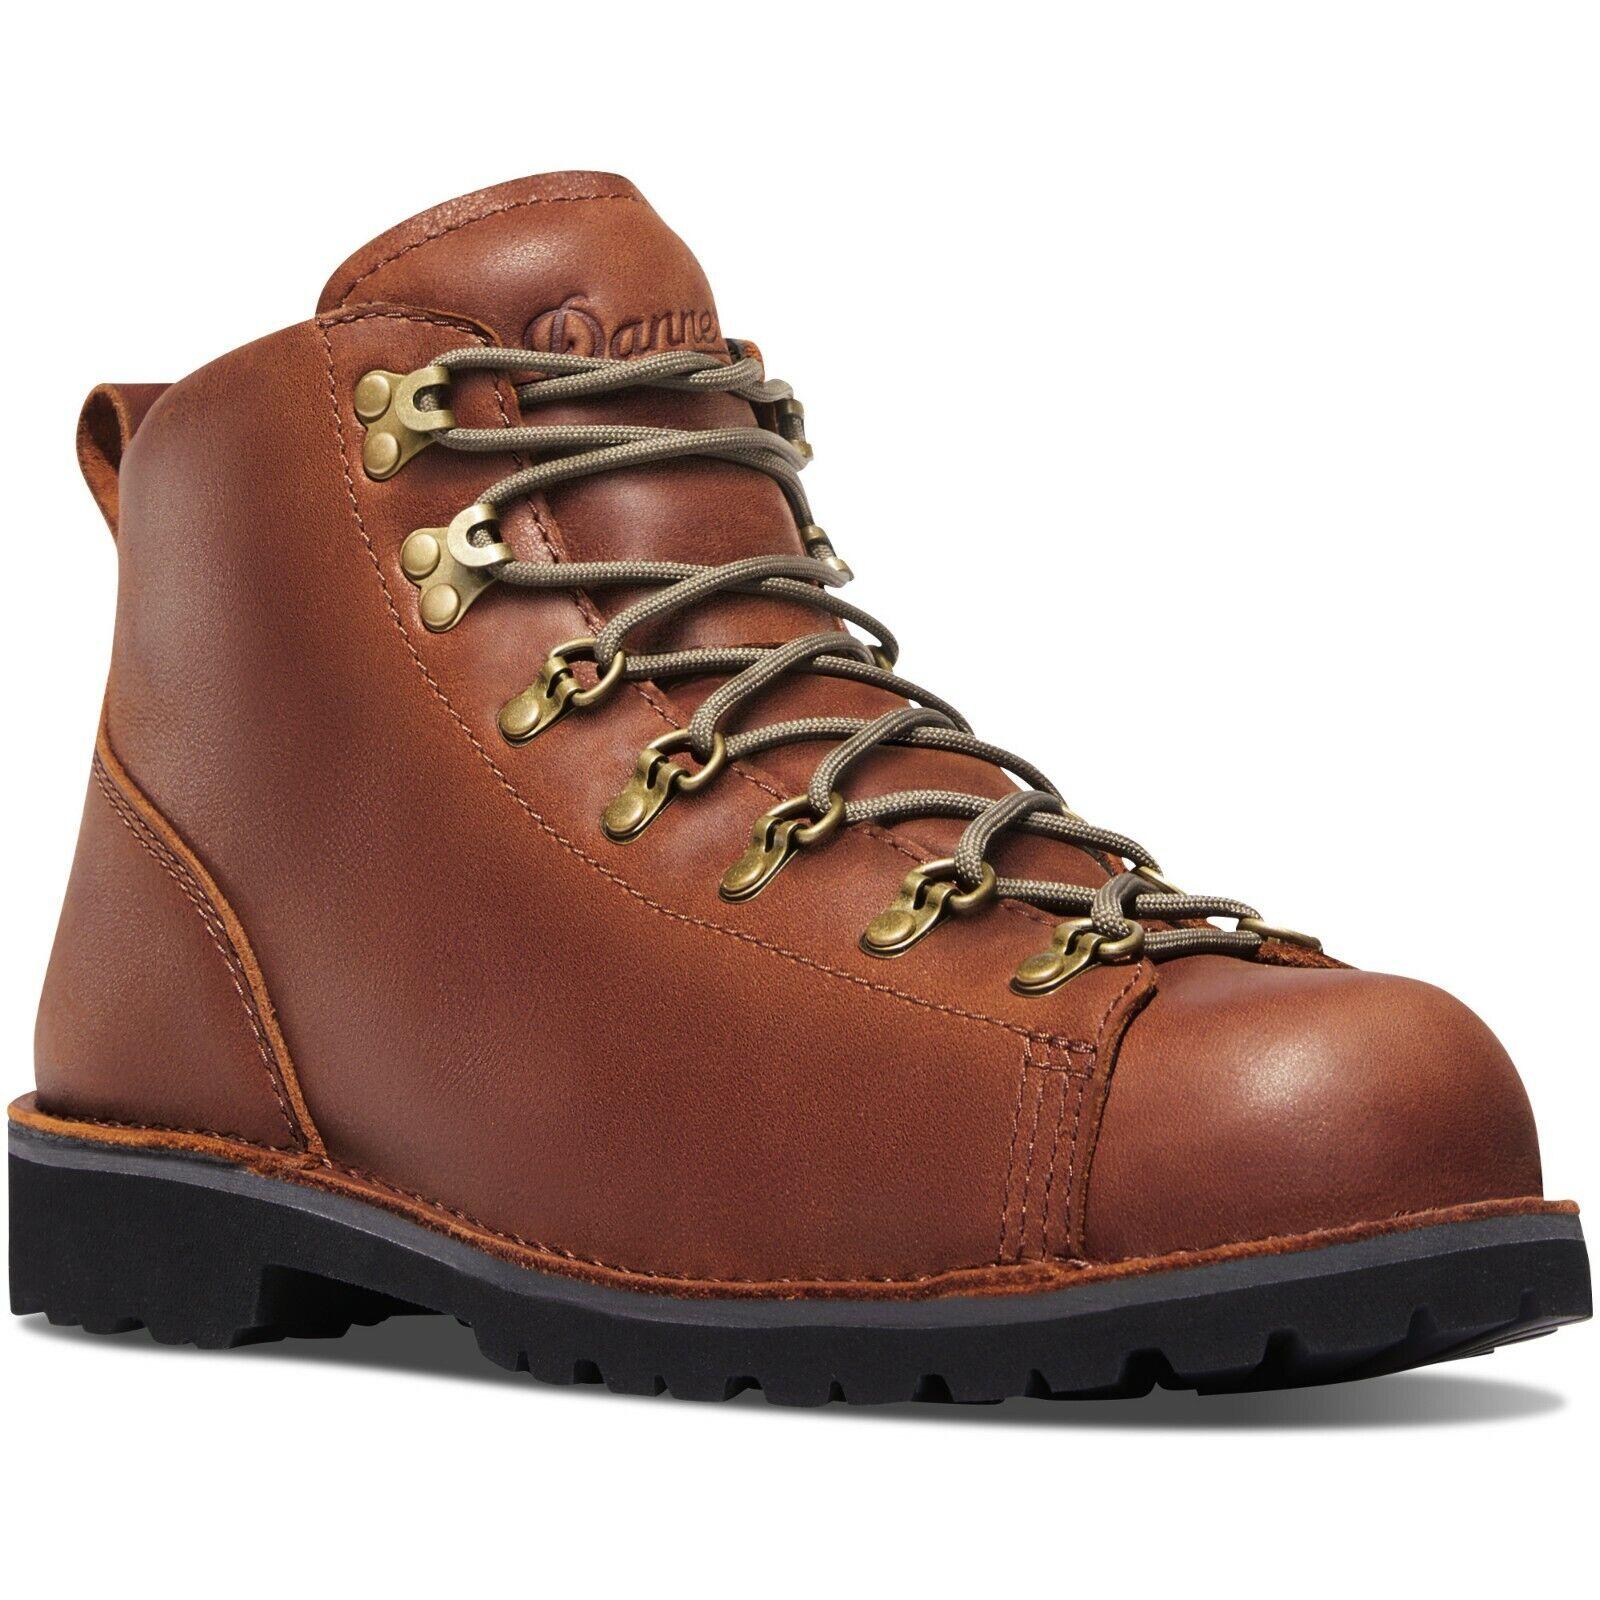 Homme Danner 32760 6  North Fork Rambler Graham Chaussures en cuir chaussures de chasse